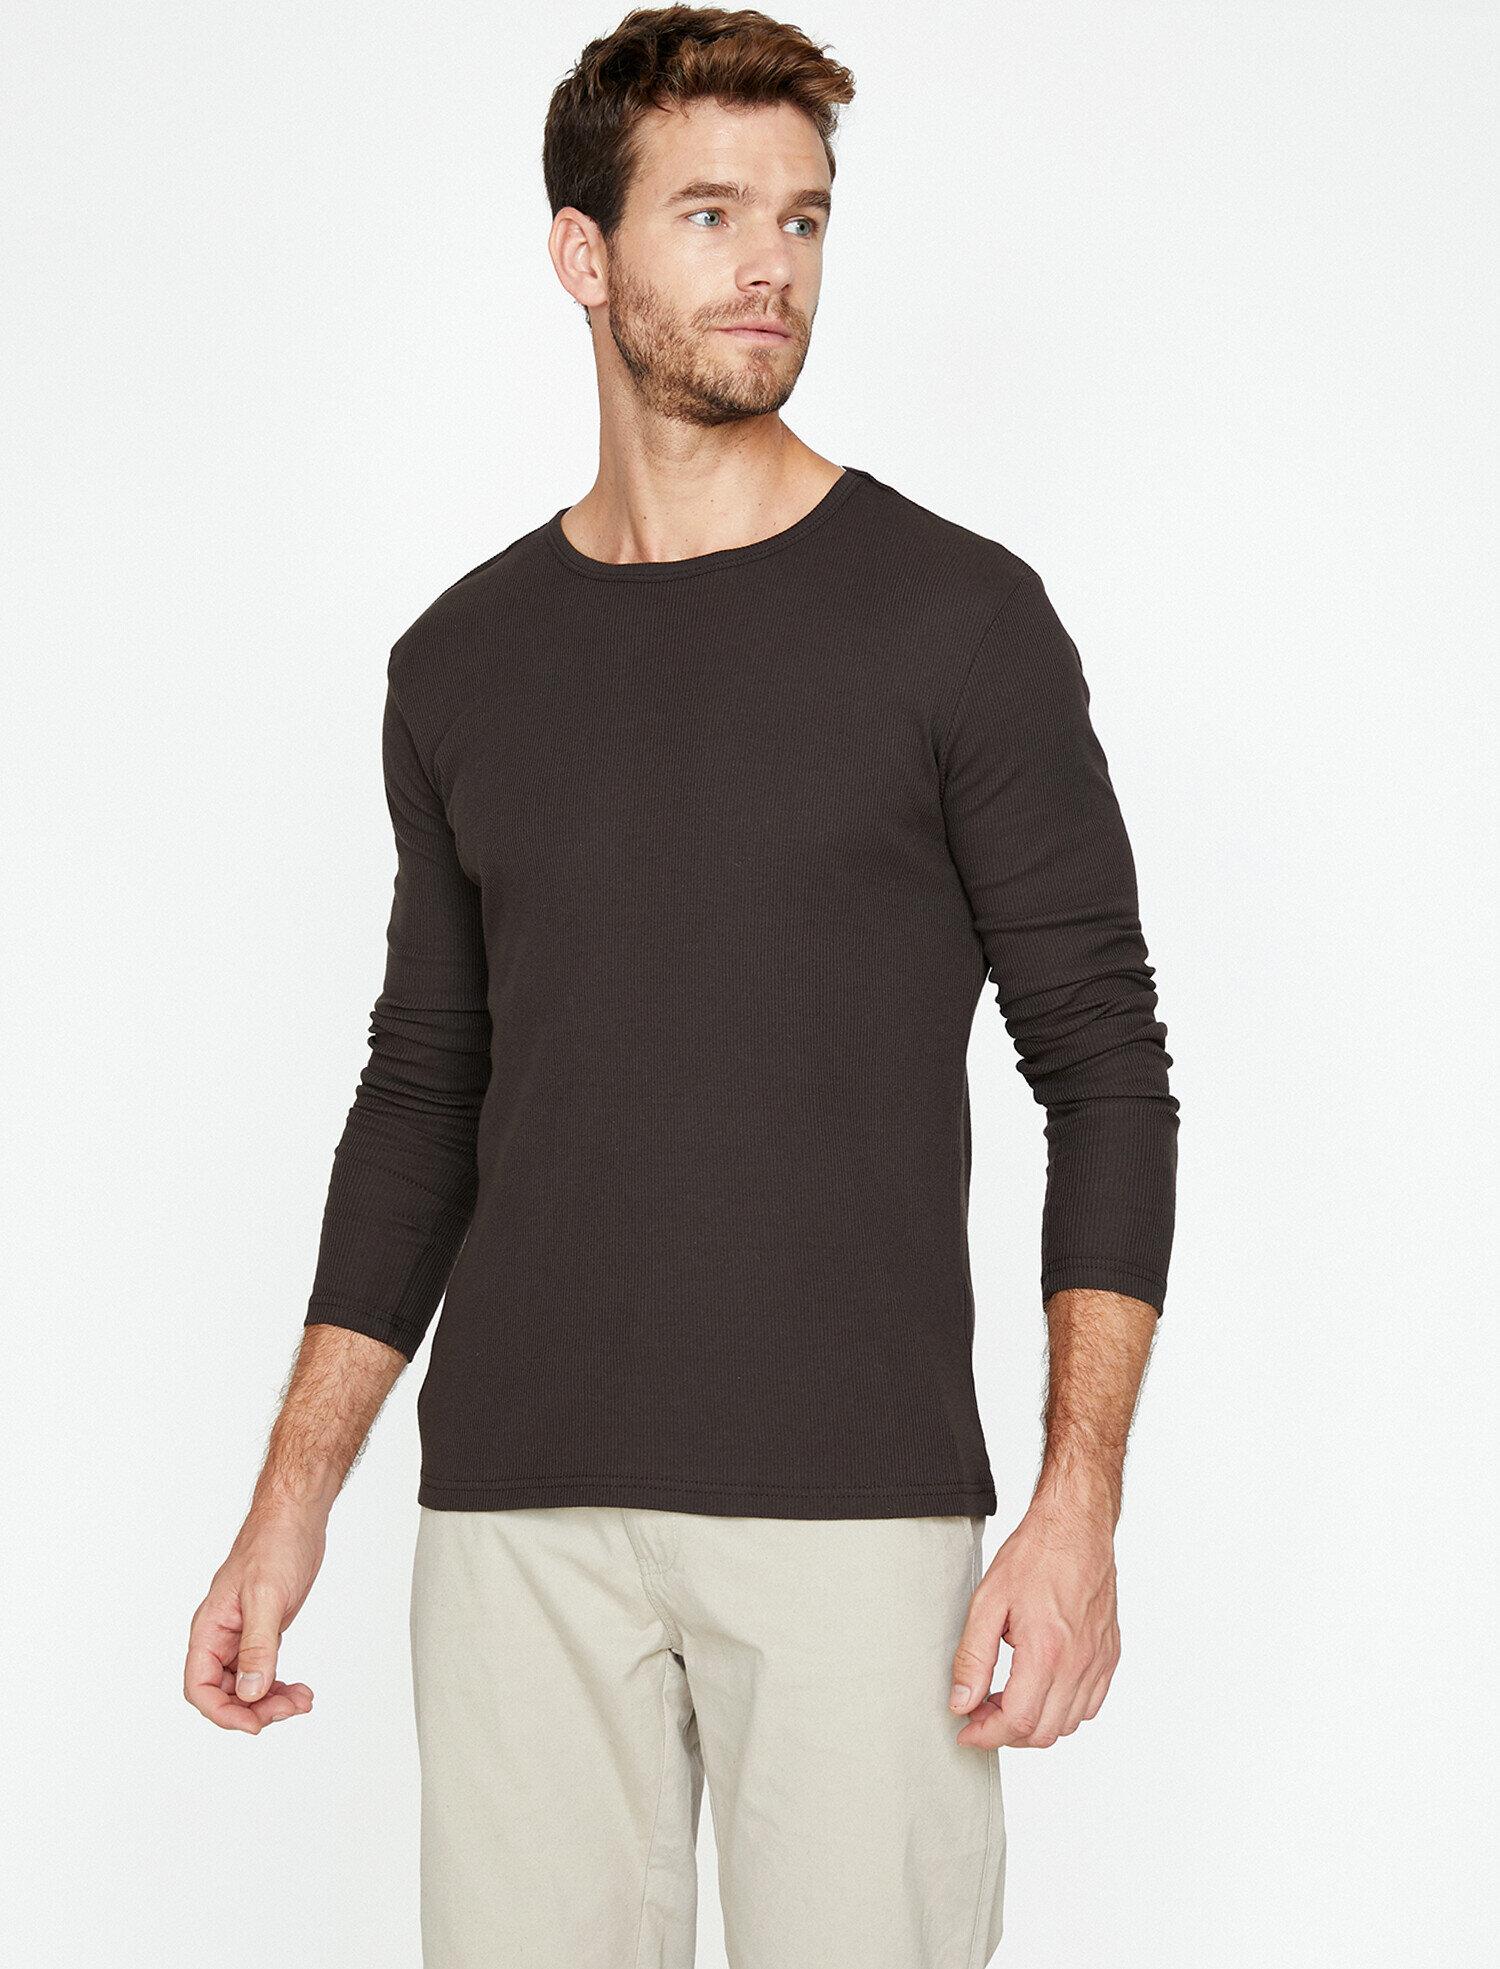 Koton Erkek Bisiklet Yaka T-Shirt Mor Ürün Resmi